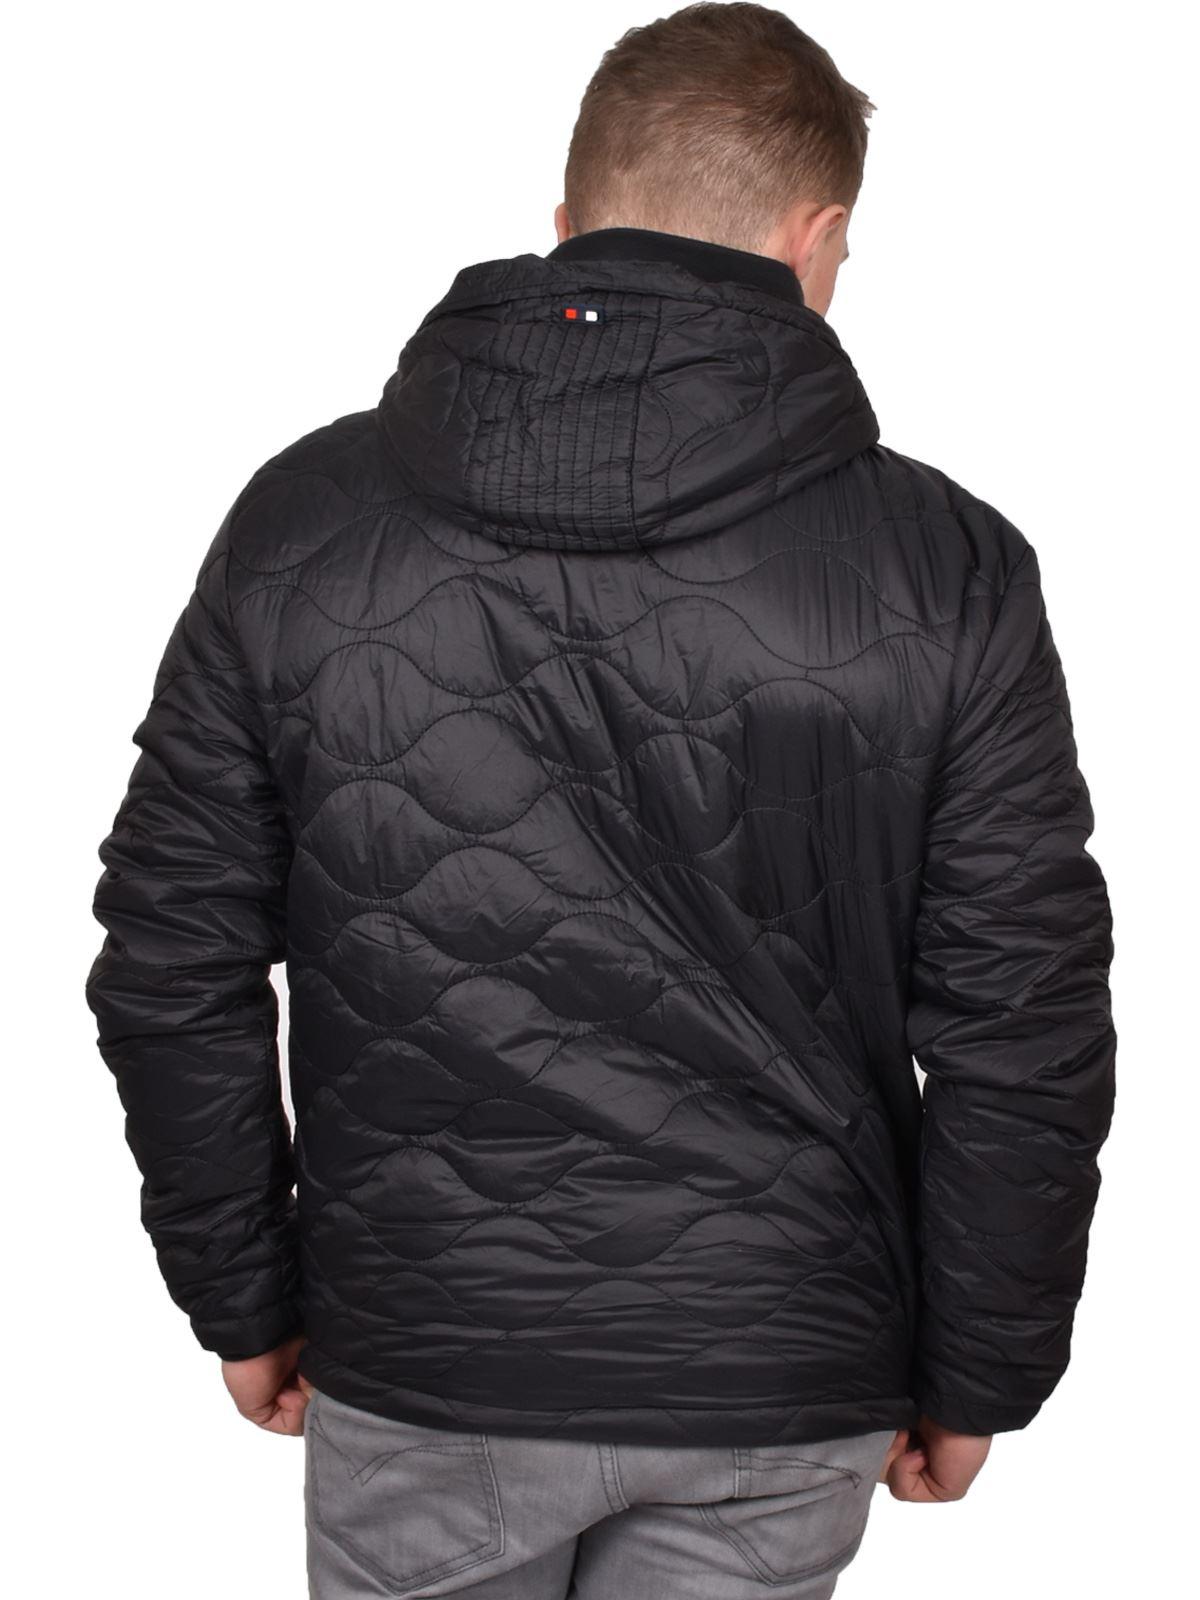 Mens-Smith-amp-Jones-Jacket-Full-Zip-Fleece-Lined-Hooded-Light-Weight-Warm-Coat thumbnail 6